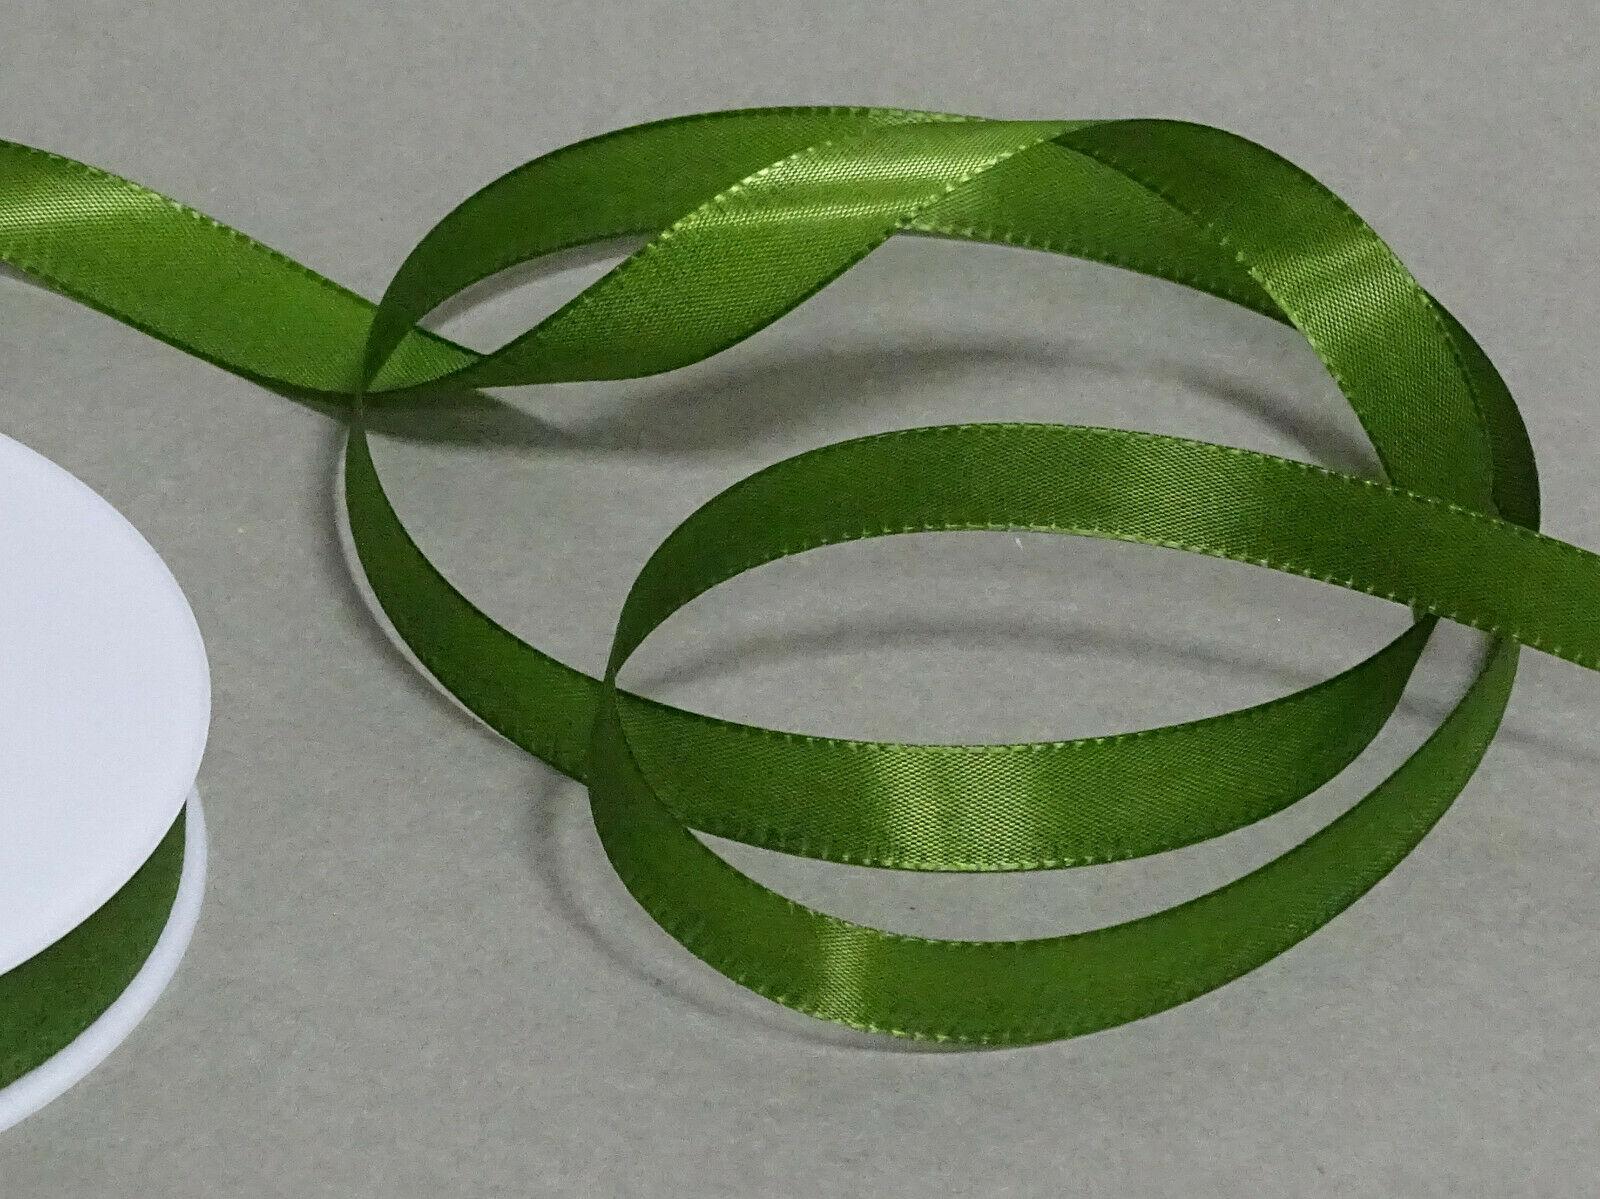 Seidenband Schleifenband 50 m x 15 / 25 / 40mm Dekoband ab 0,08€/m Geschenkband  - Olivgrün 111, 25 mm x 50 m